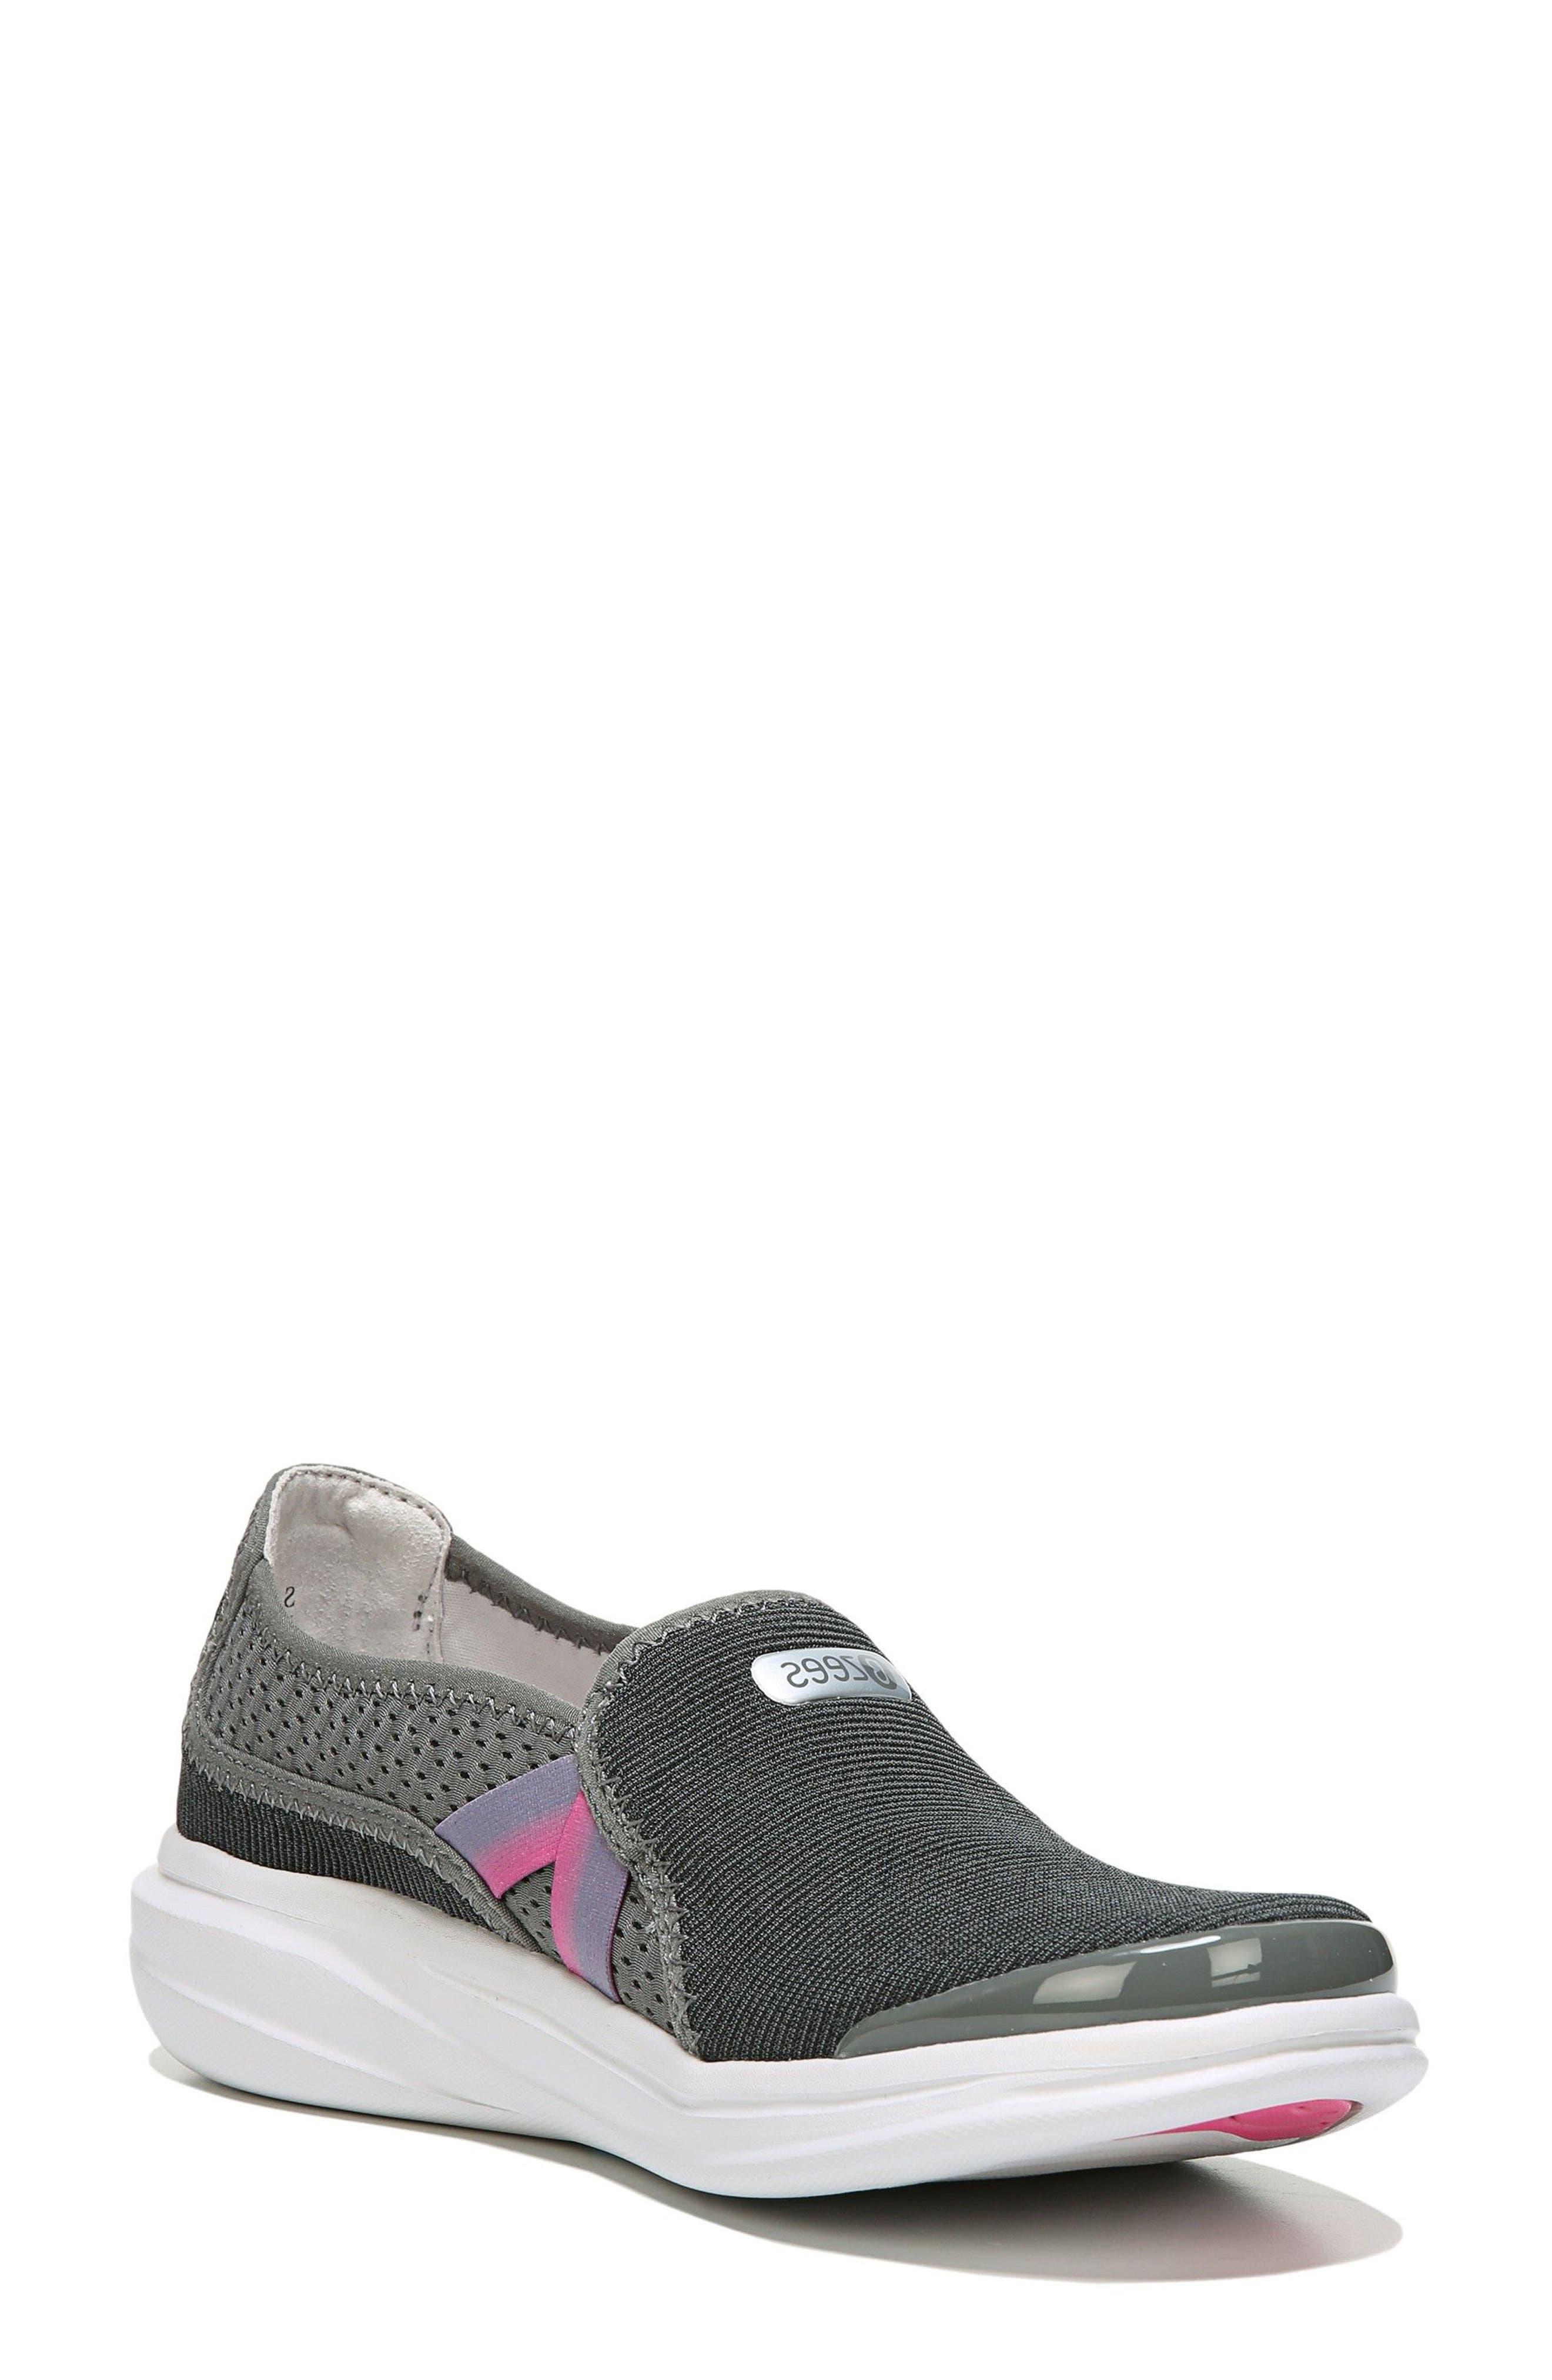 Cruise Slip-On Sneaker,                         Main,                         color, DARK GREY FABRIC